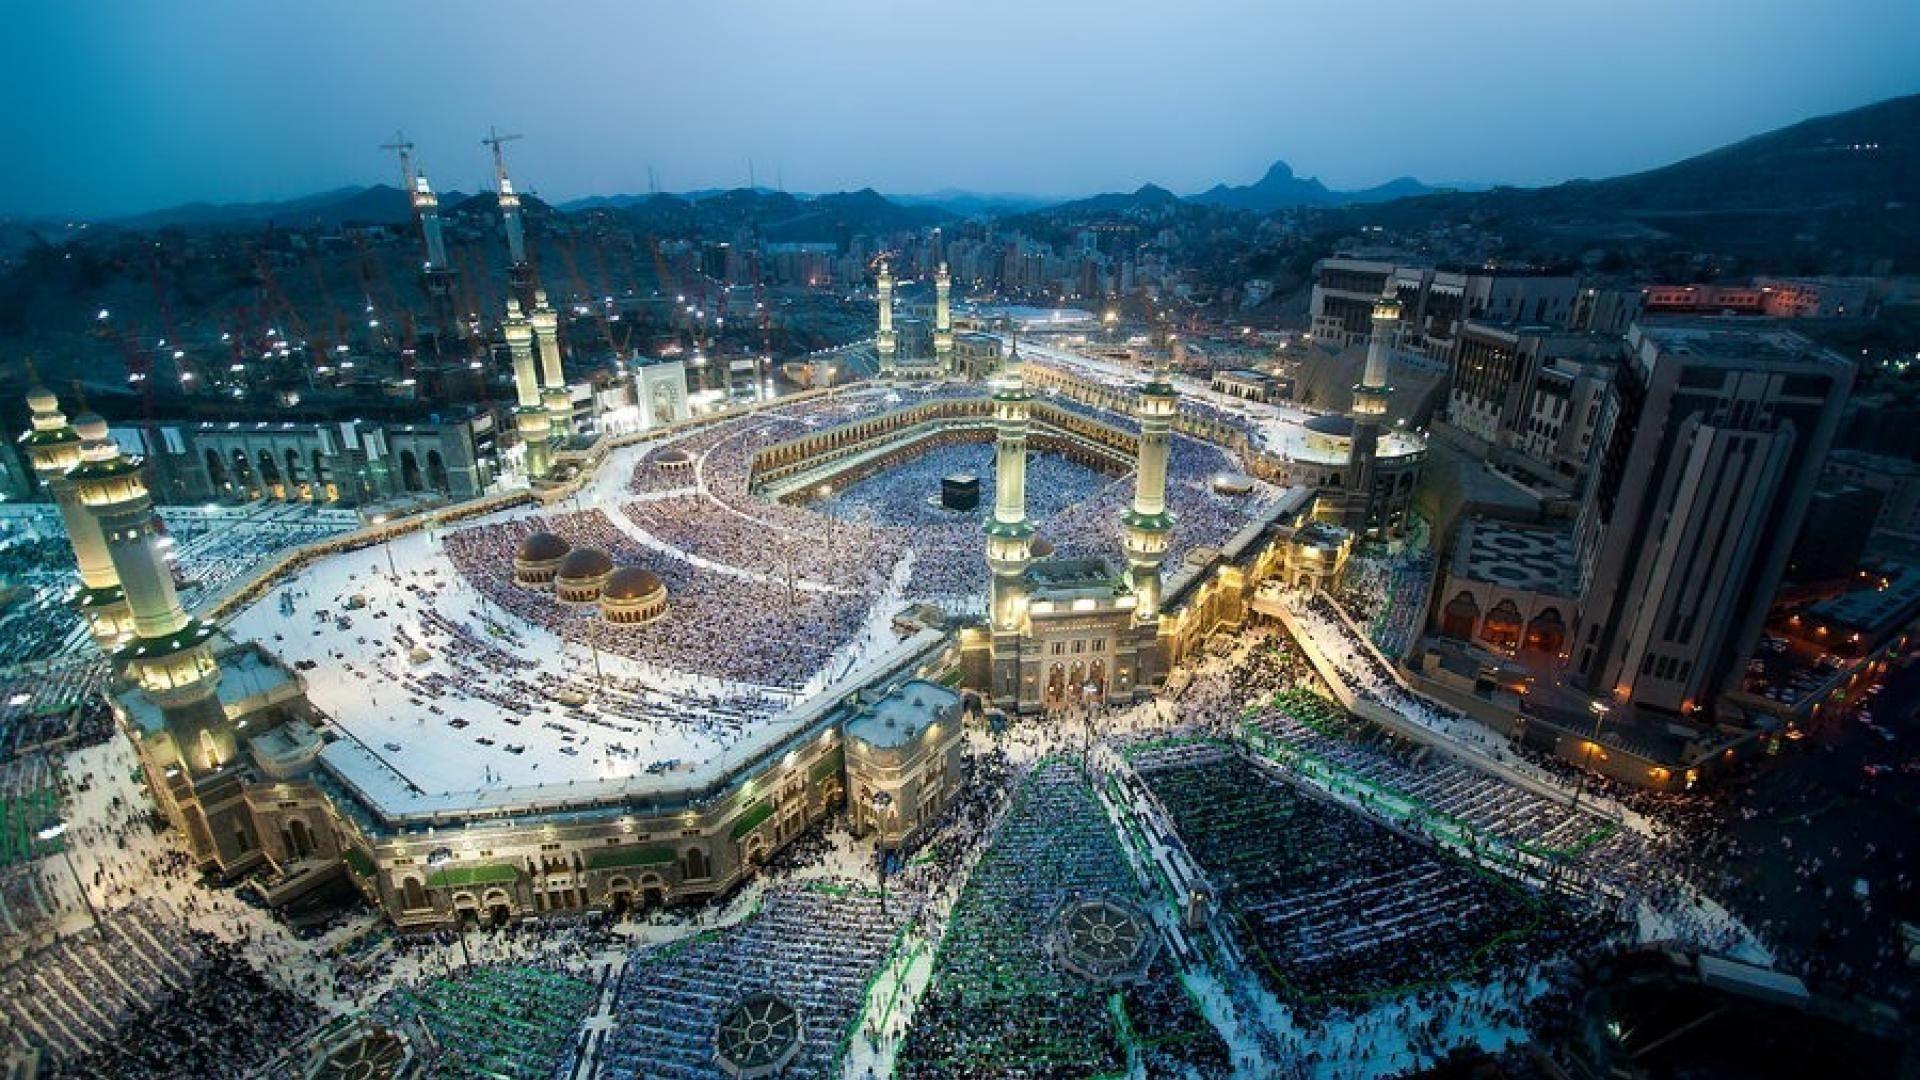 Mecca Madina Hd Wallpapers 1366x768 Group 57 Download For Free Kota Tours Mekah